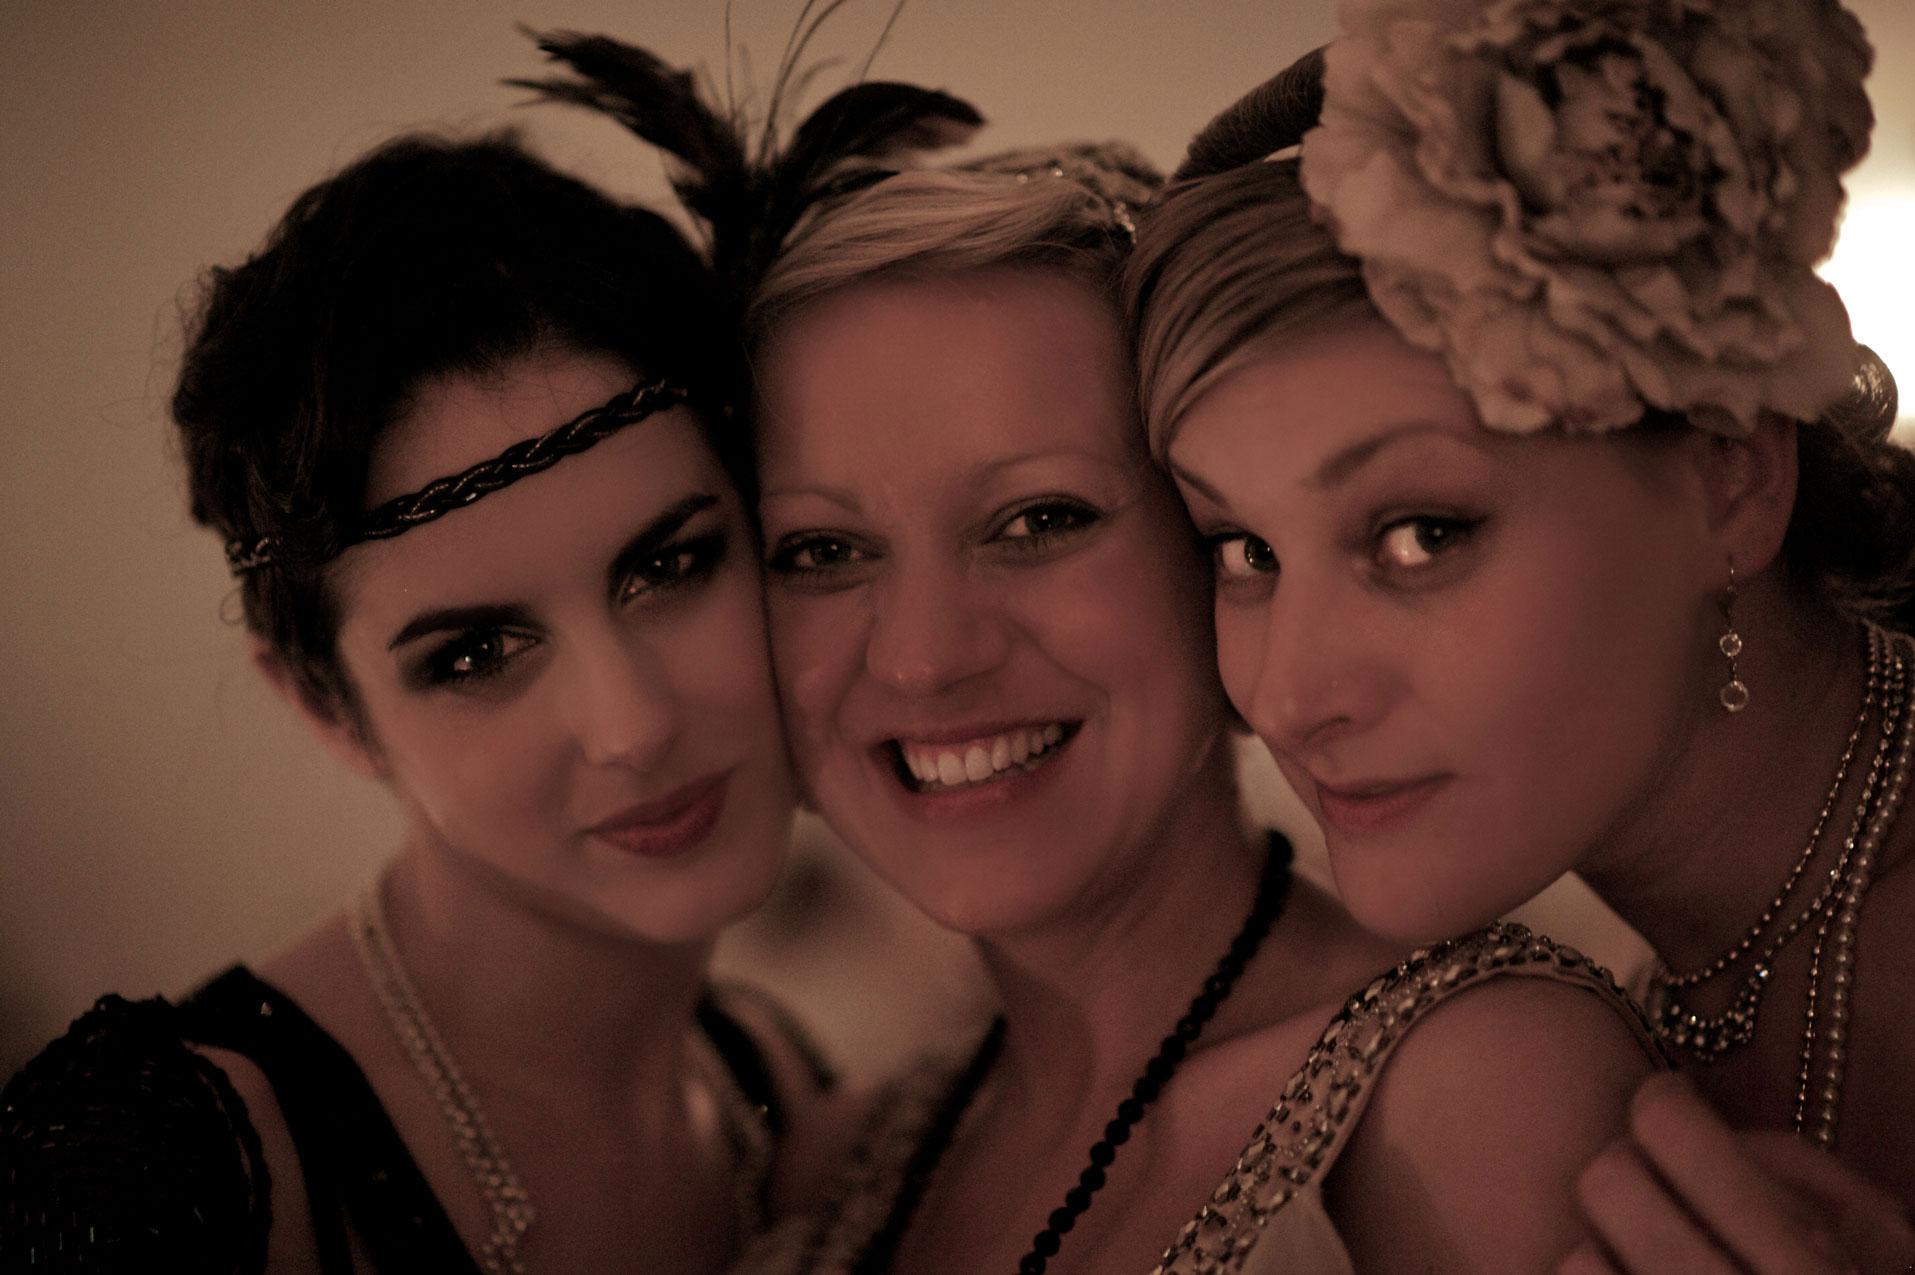 Three flapper ladies cheek to cheek